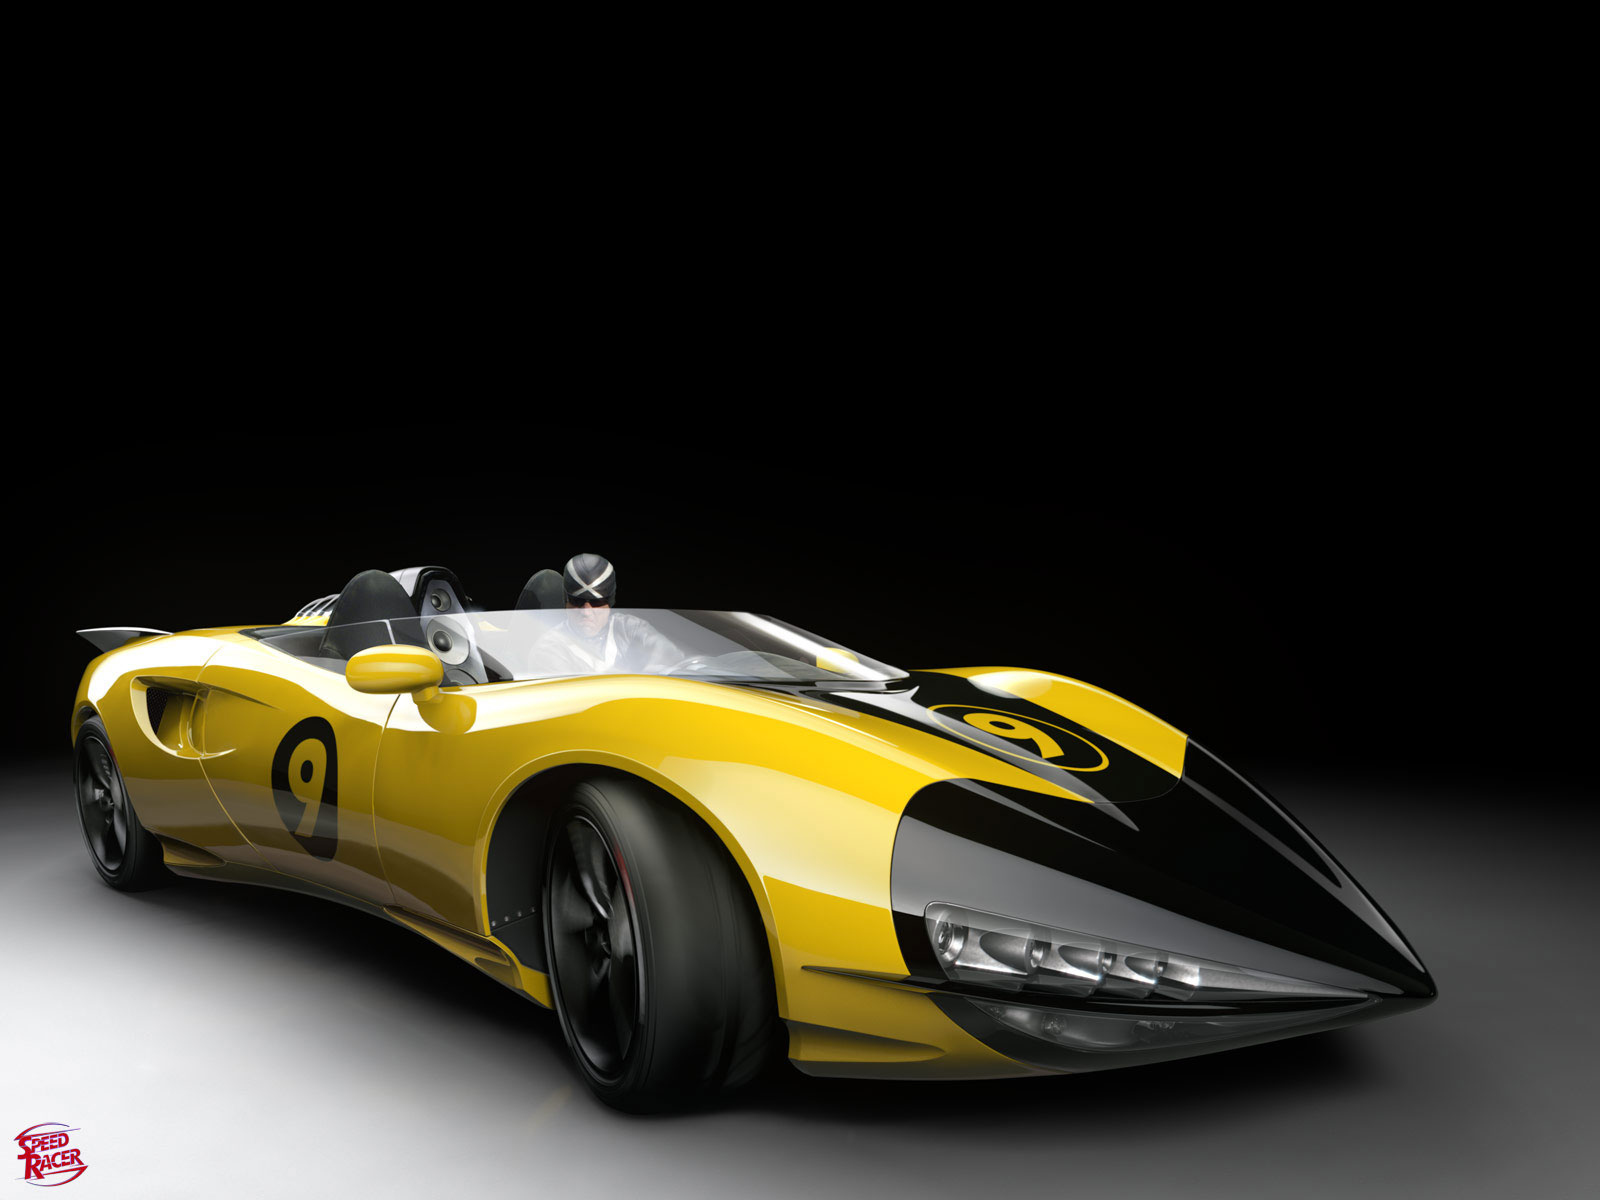 amazing car photos speed racer cars